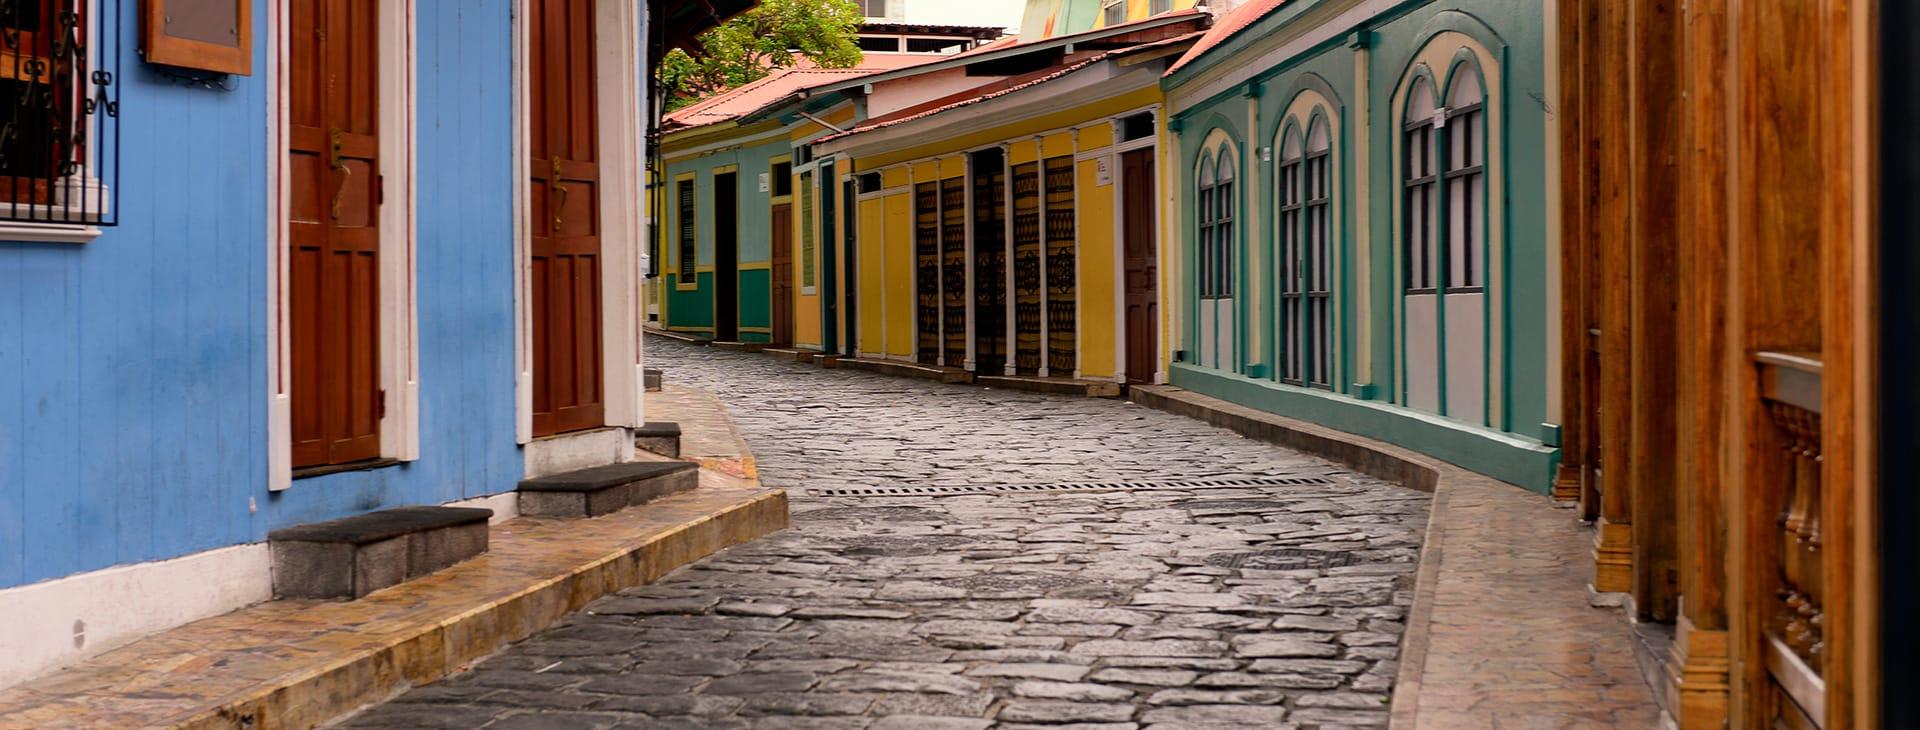 Guayaquil cobblestone streets